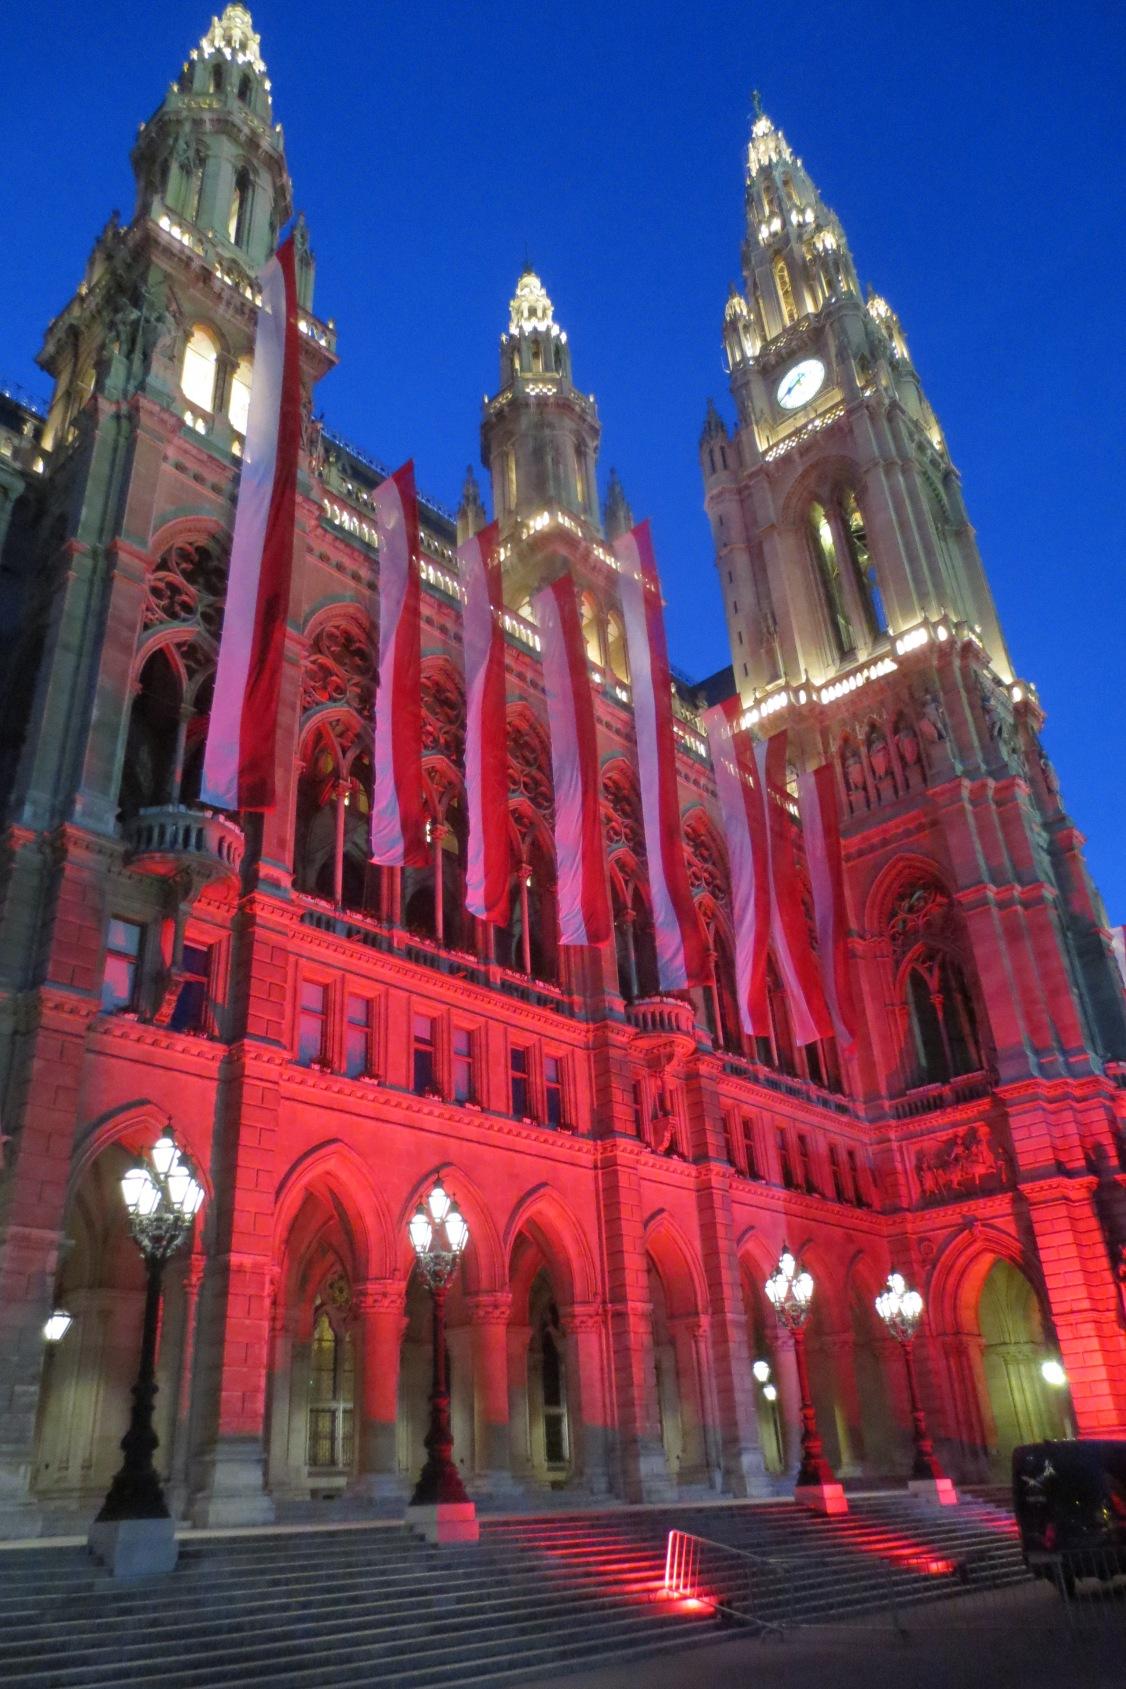 Das rote Rathaus © Wolfgang Stoephasius